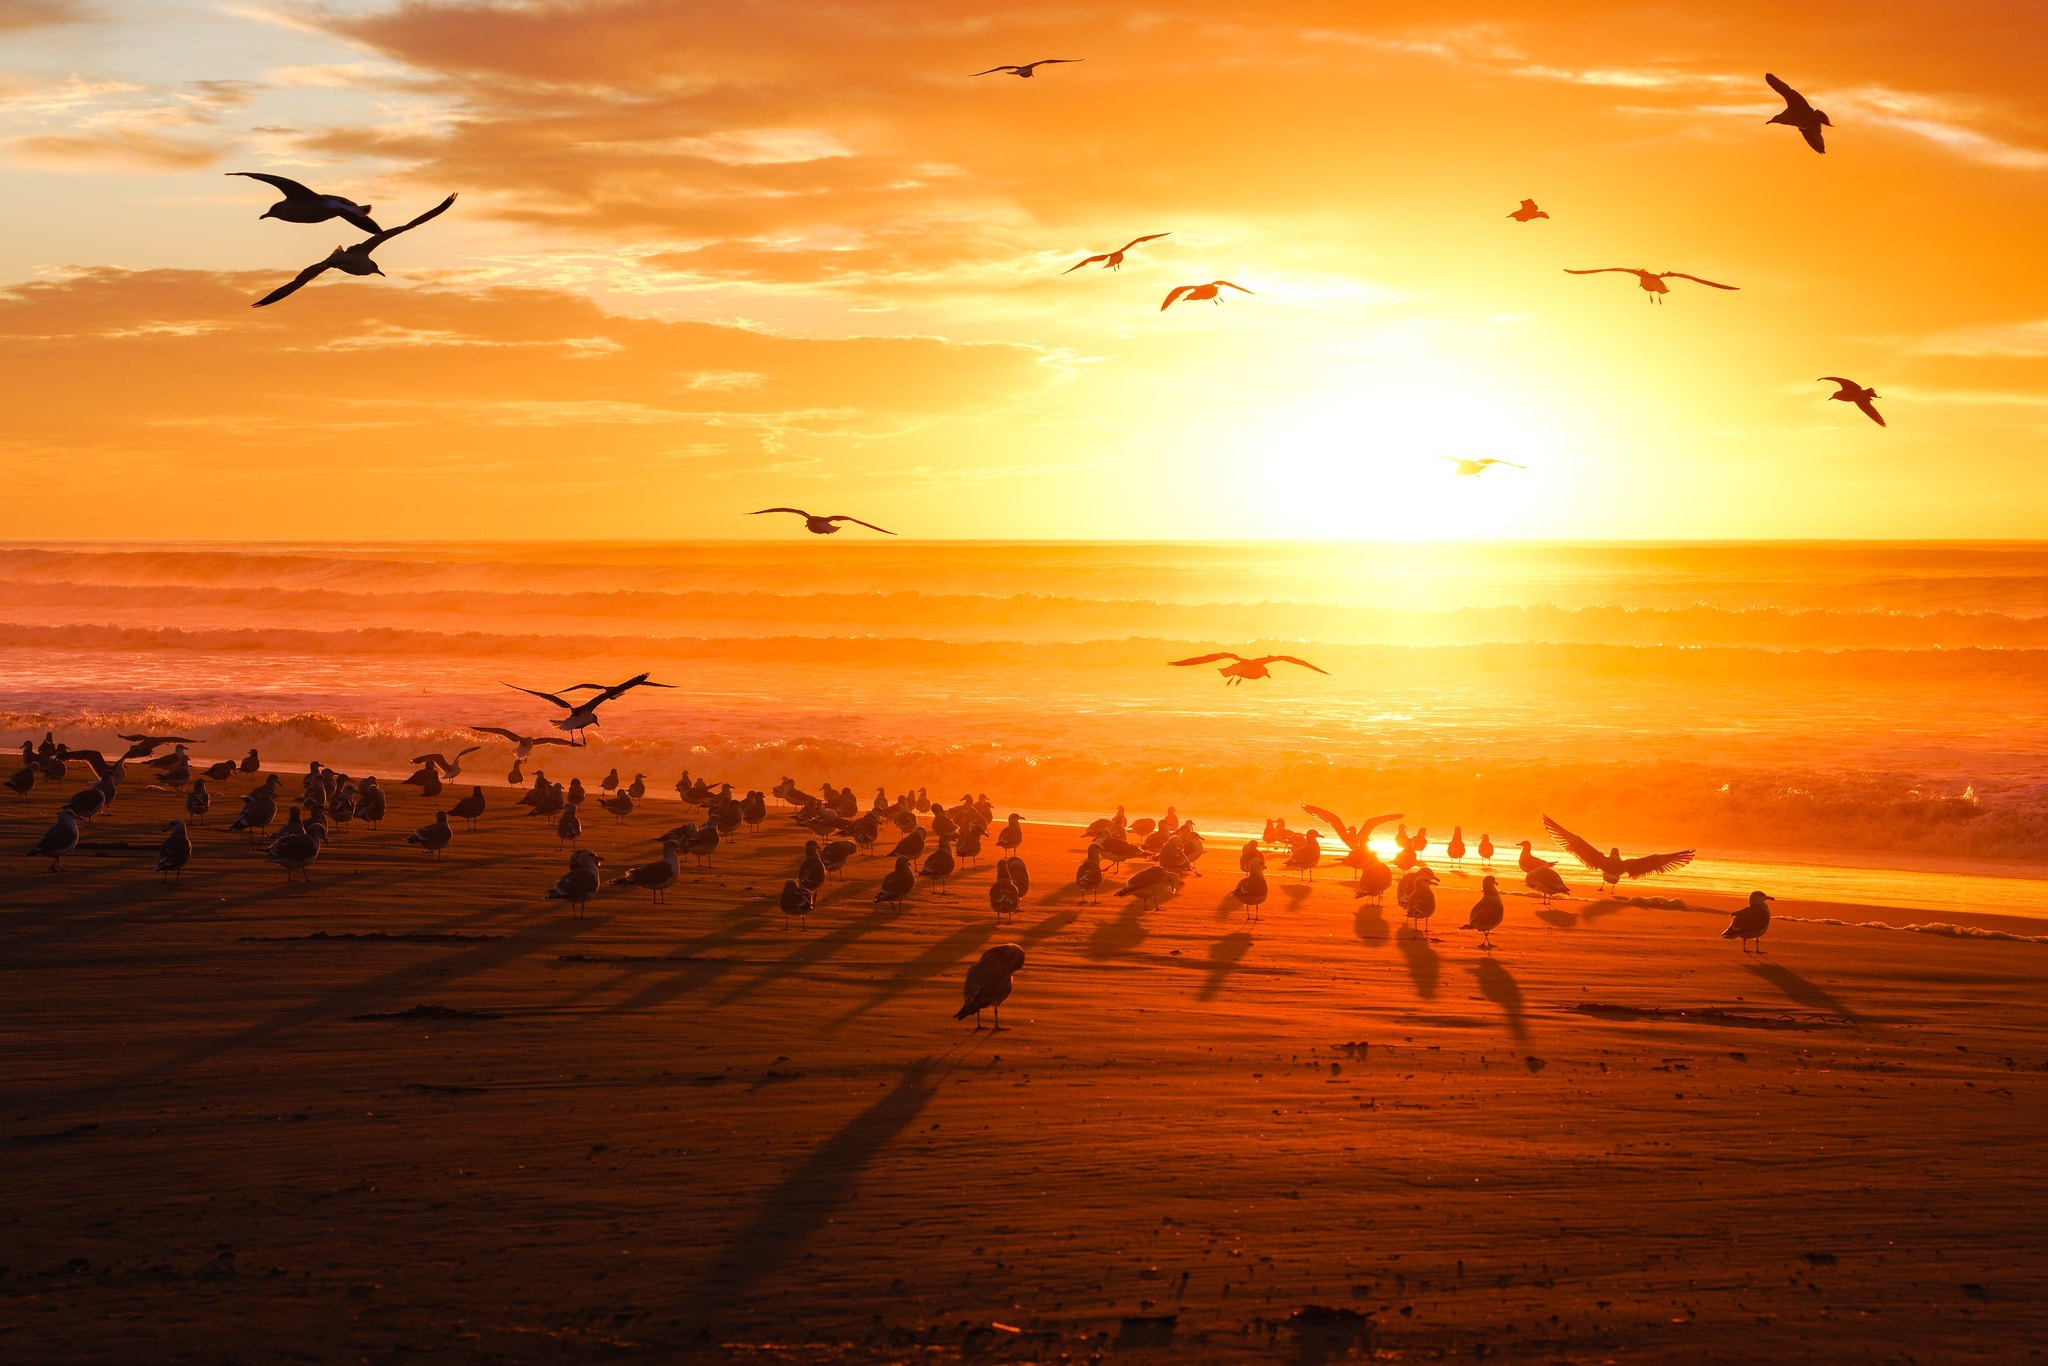 Flock Of Birds Sunset Horizon 2048x1366